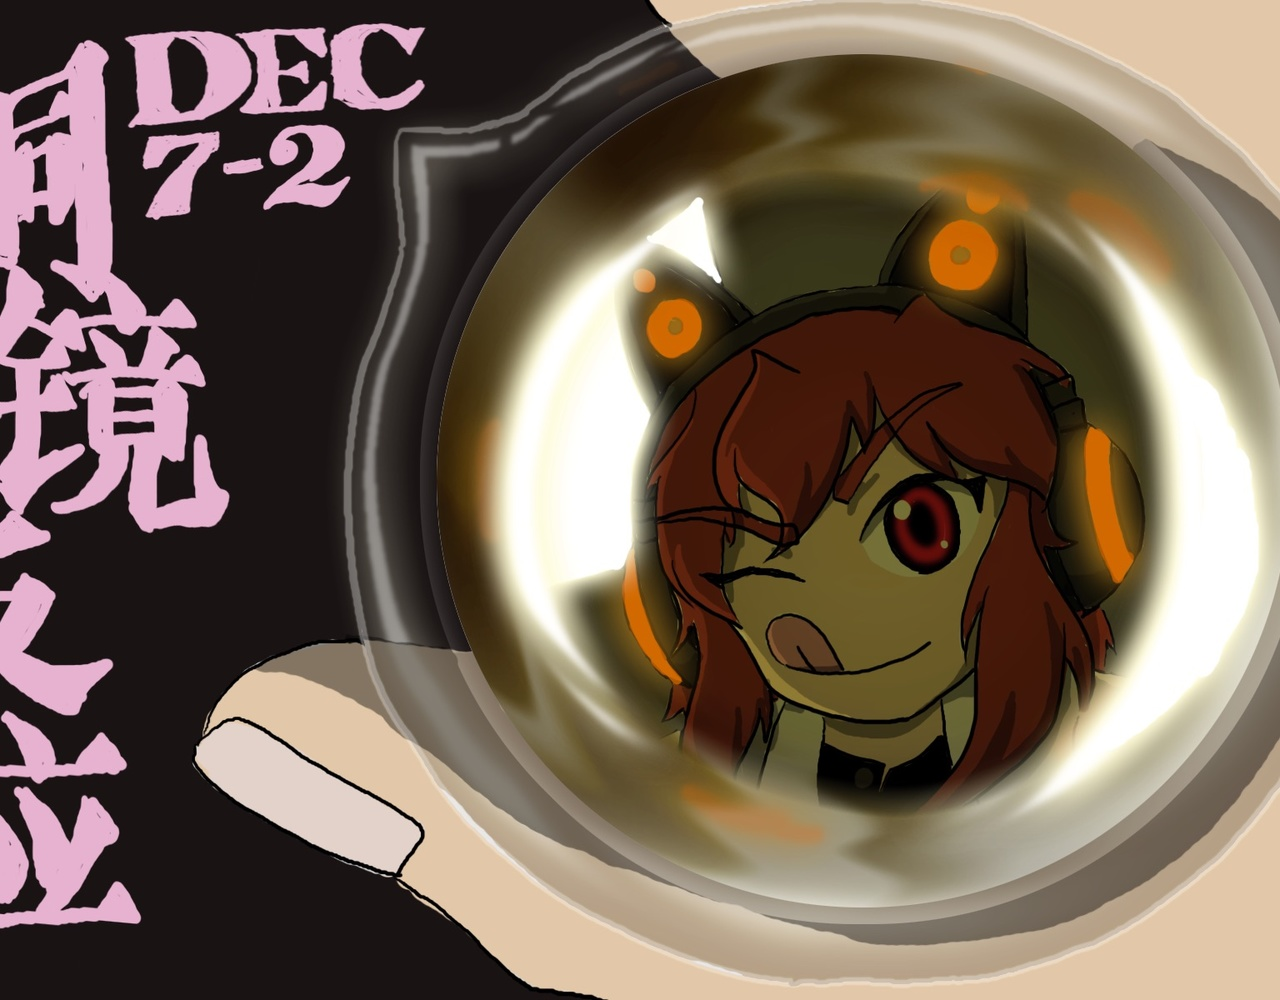 【DEC】S7E2 铜镜反应:超脱定式才能实现的金属镜实验